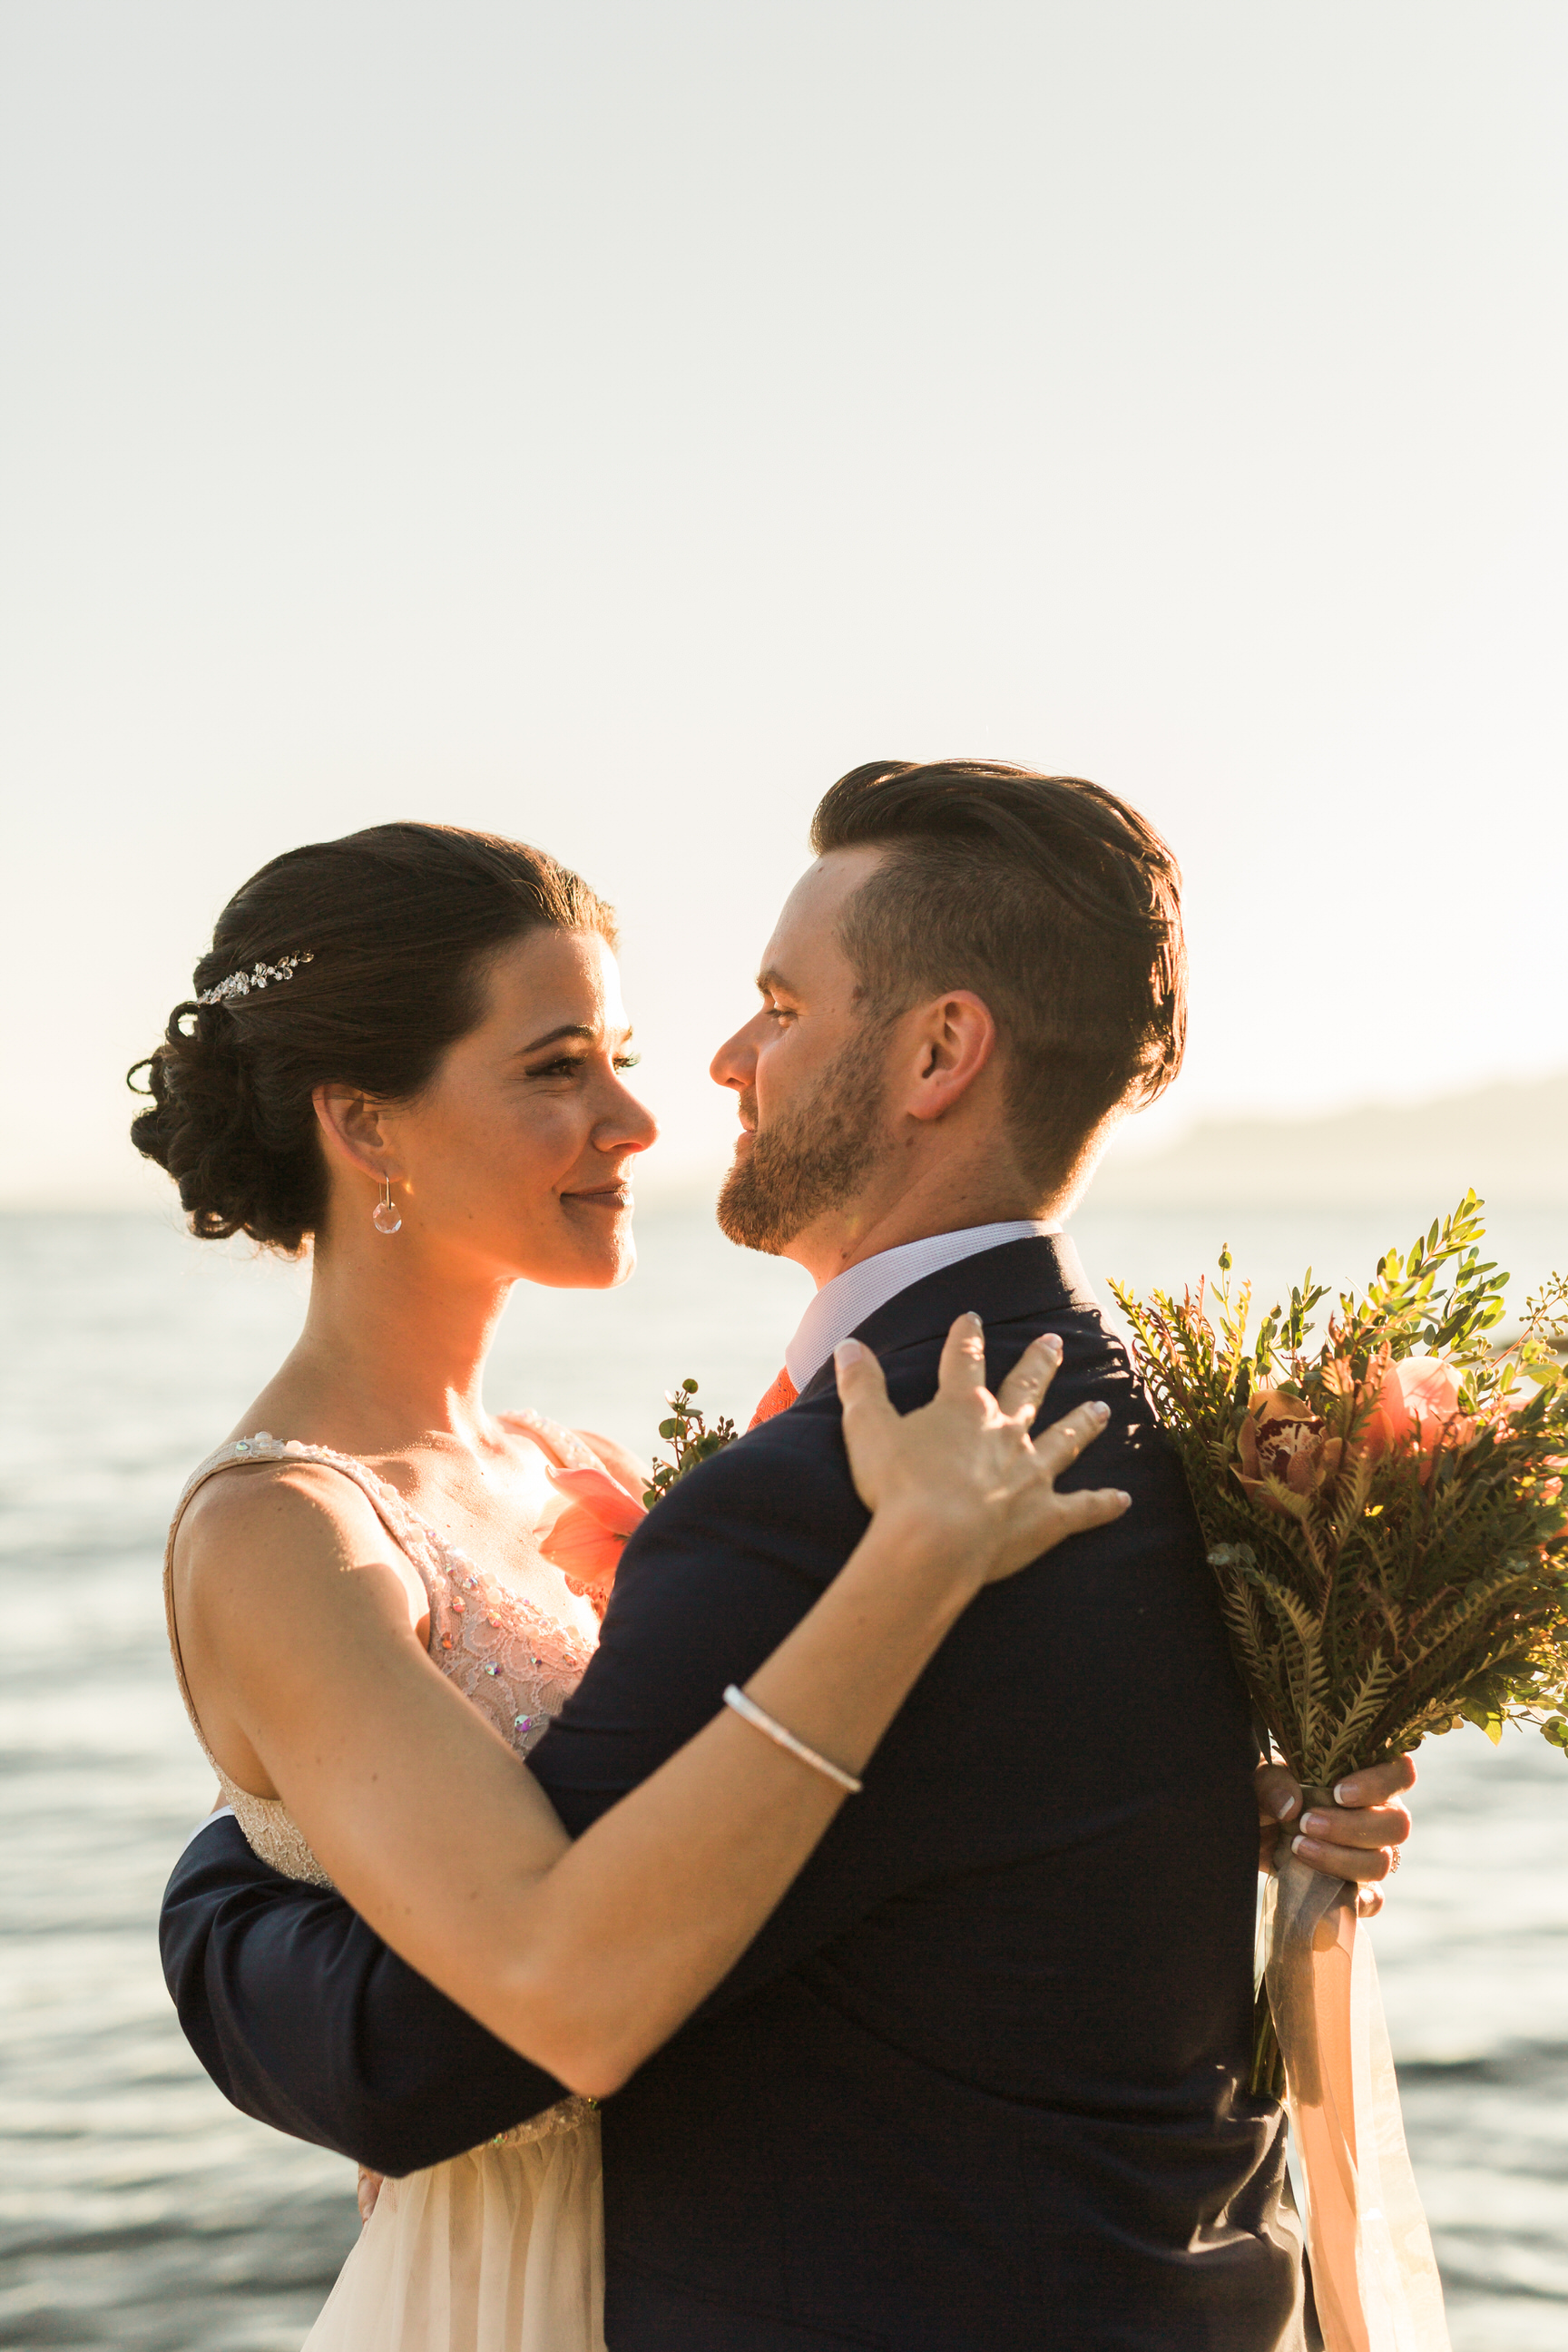 Rockwater Secret Cove Resort Wedding - Sunshine Coast BC Wedding Photographer - Vancouver Wedding Photographer - Sunshine Coast Elopement Photos - IMG_1225.jpg